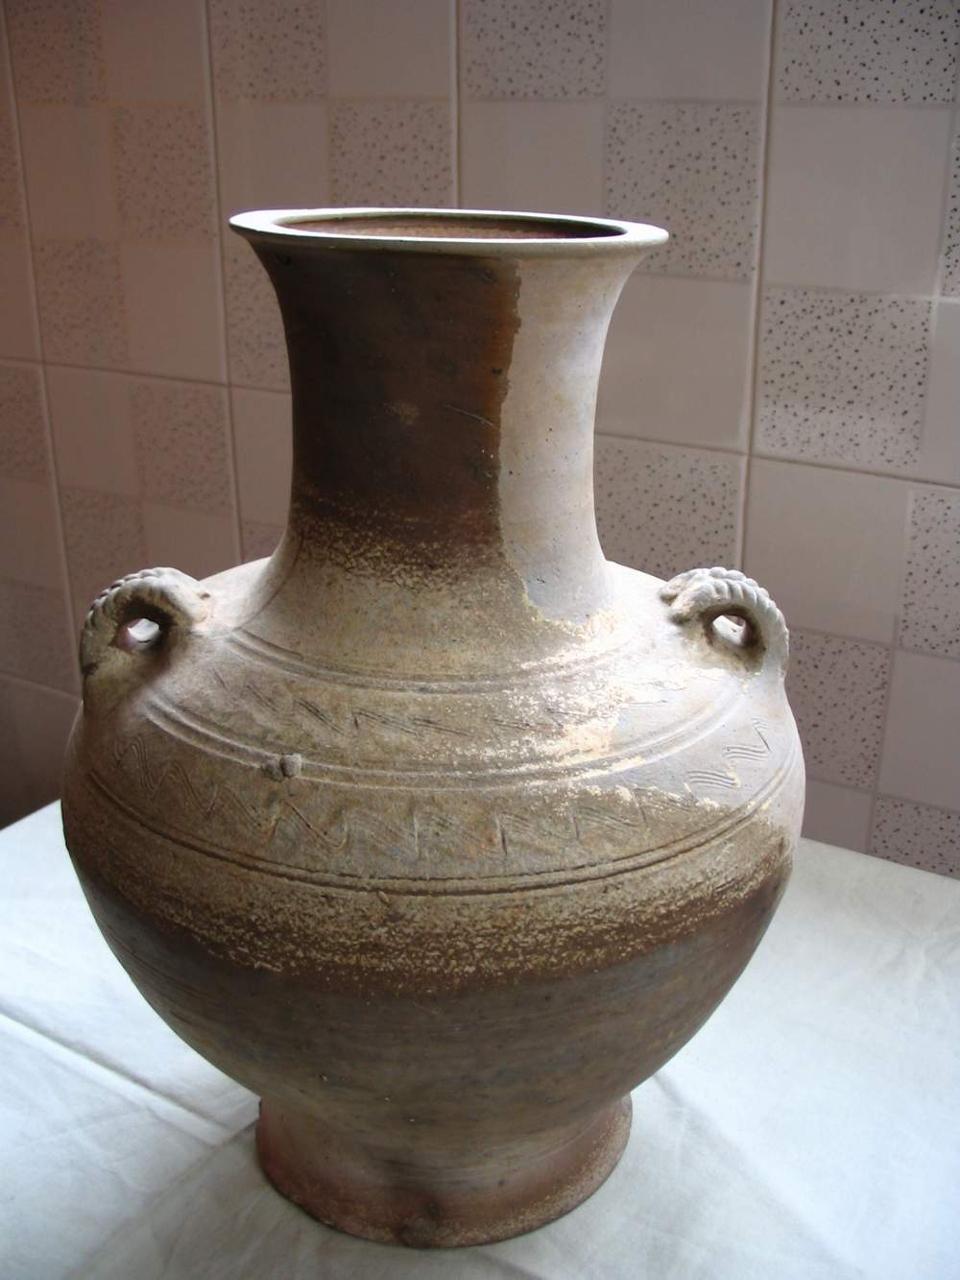 <p>原始瓷器的加工製造過程還不很精細,胎和釉的配料、溫度和火候掌握還不熟煉,質量比較差,因此叫它&ldquo;原始瓷器&rdquo;。</p>